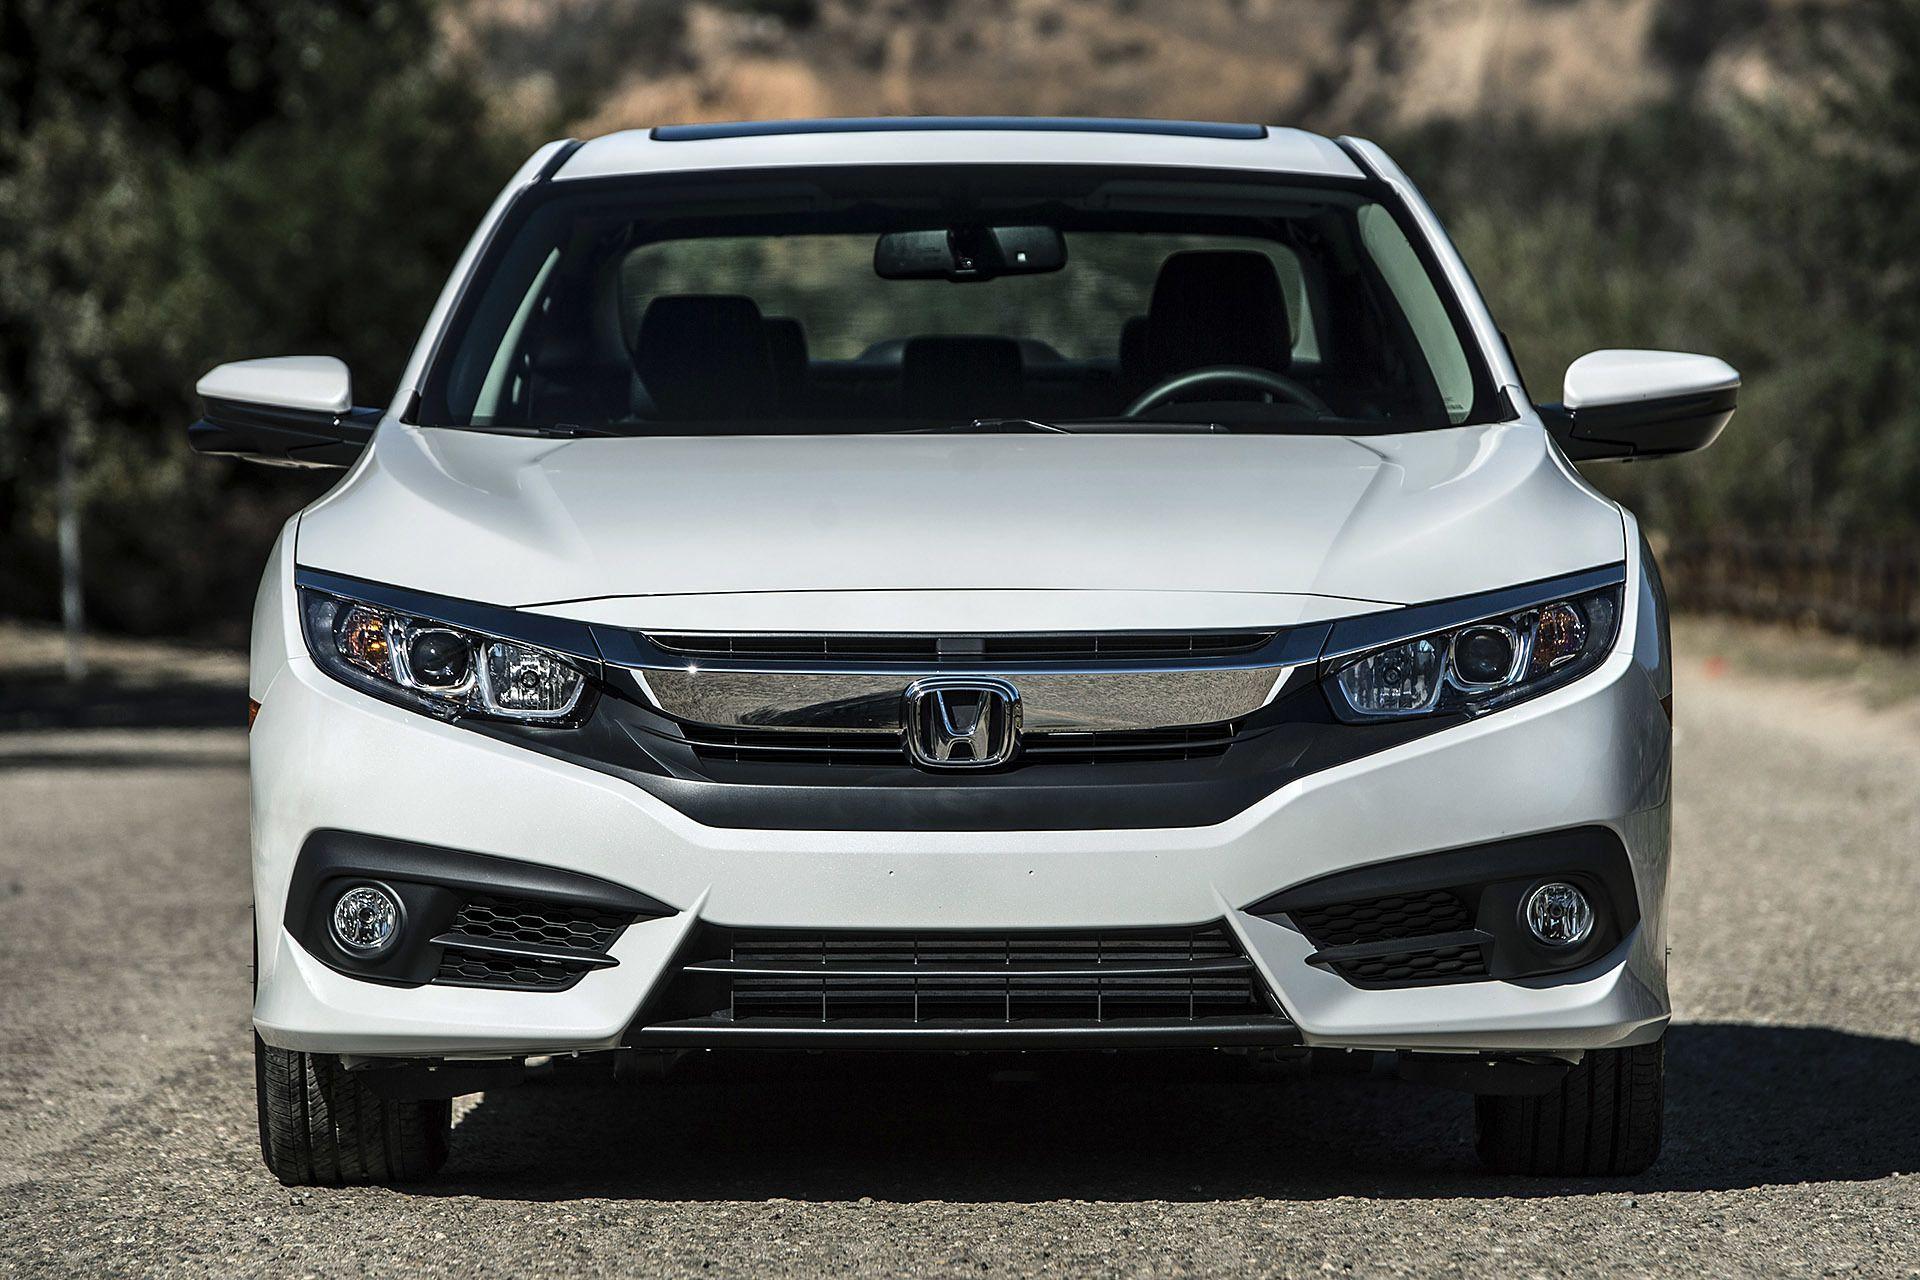 2017 Honda Civic Hybrid Review